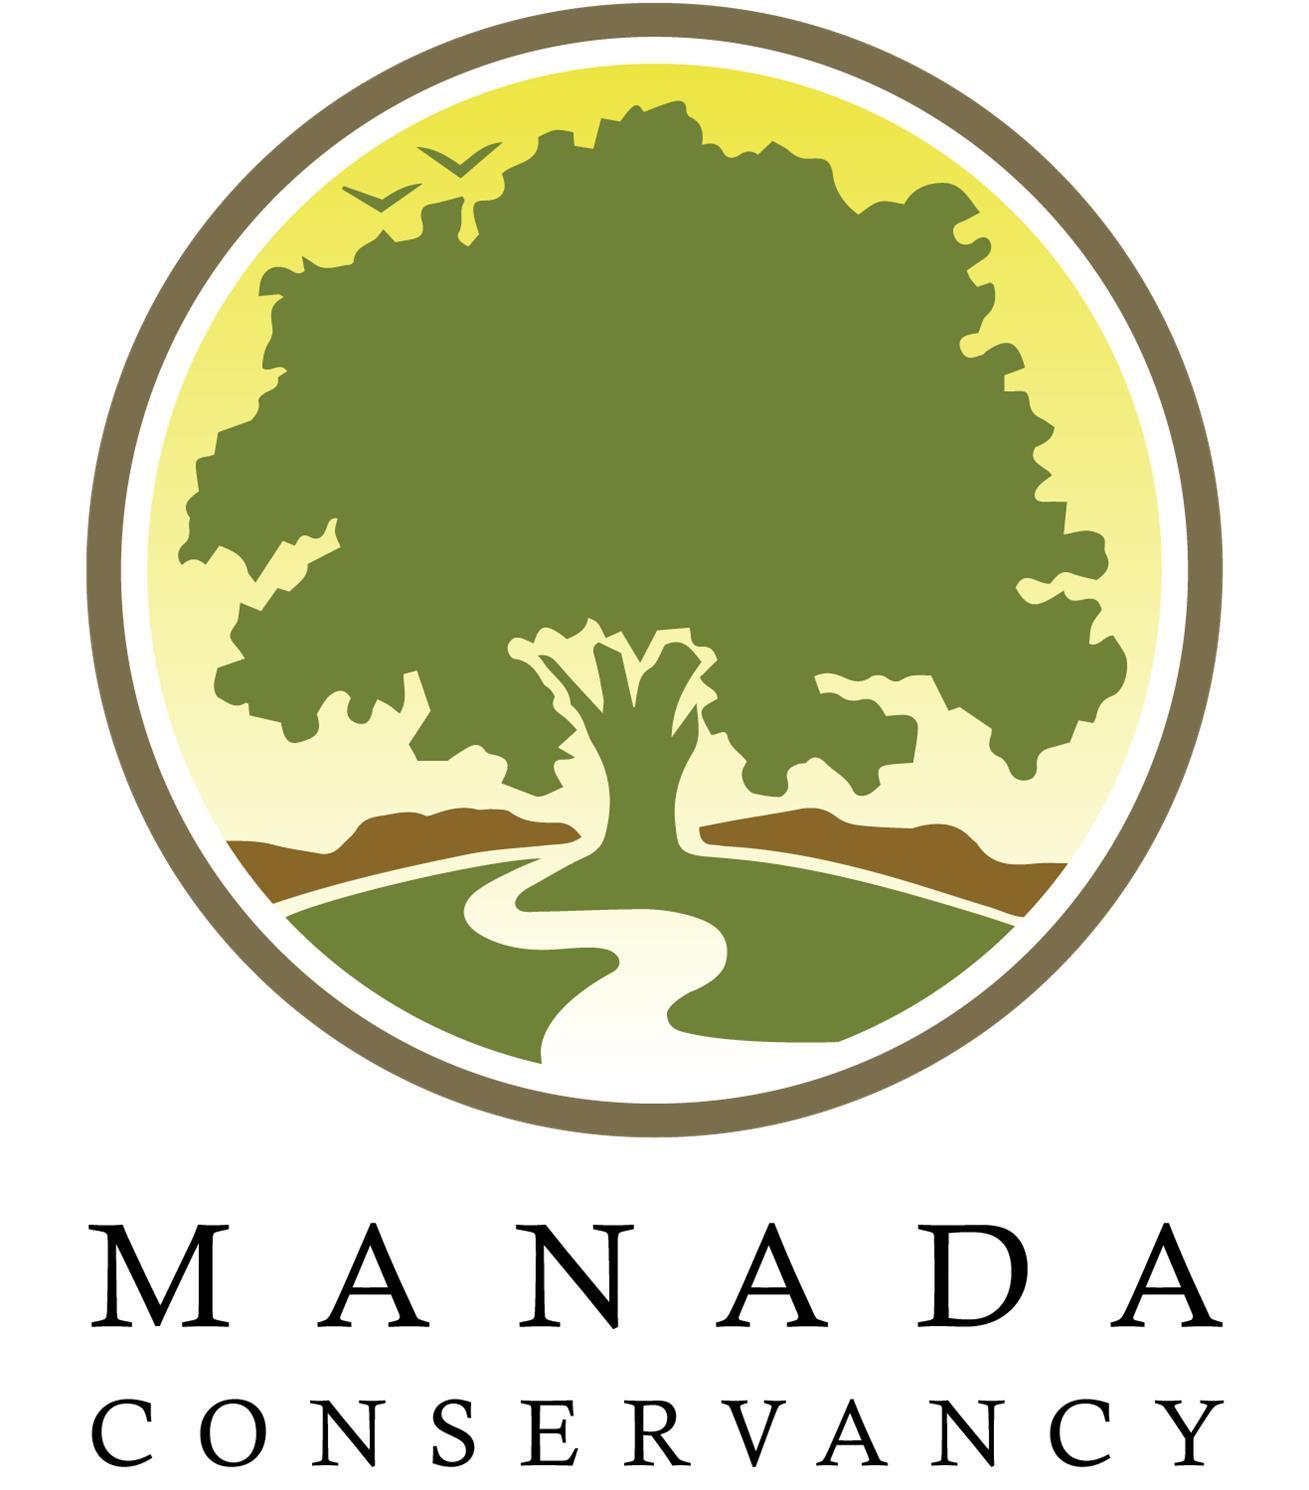 Manada Conservancy logo